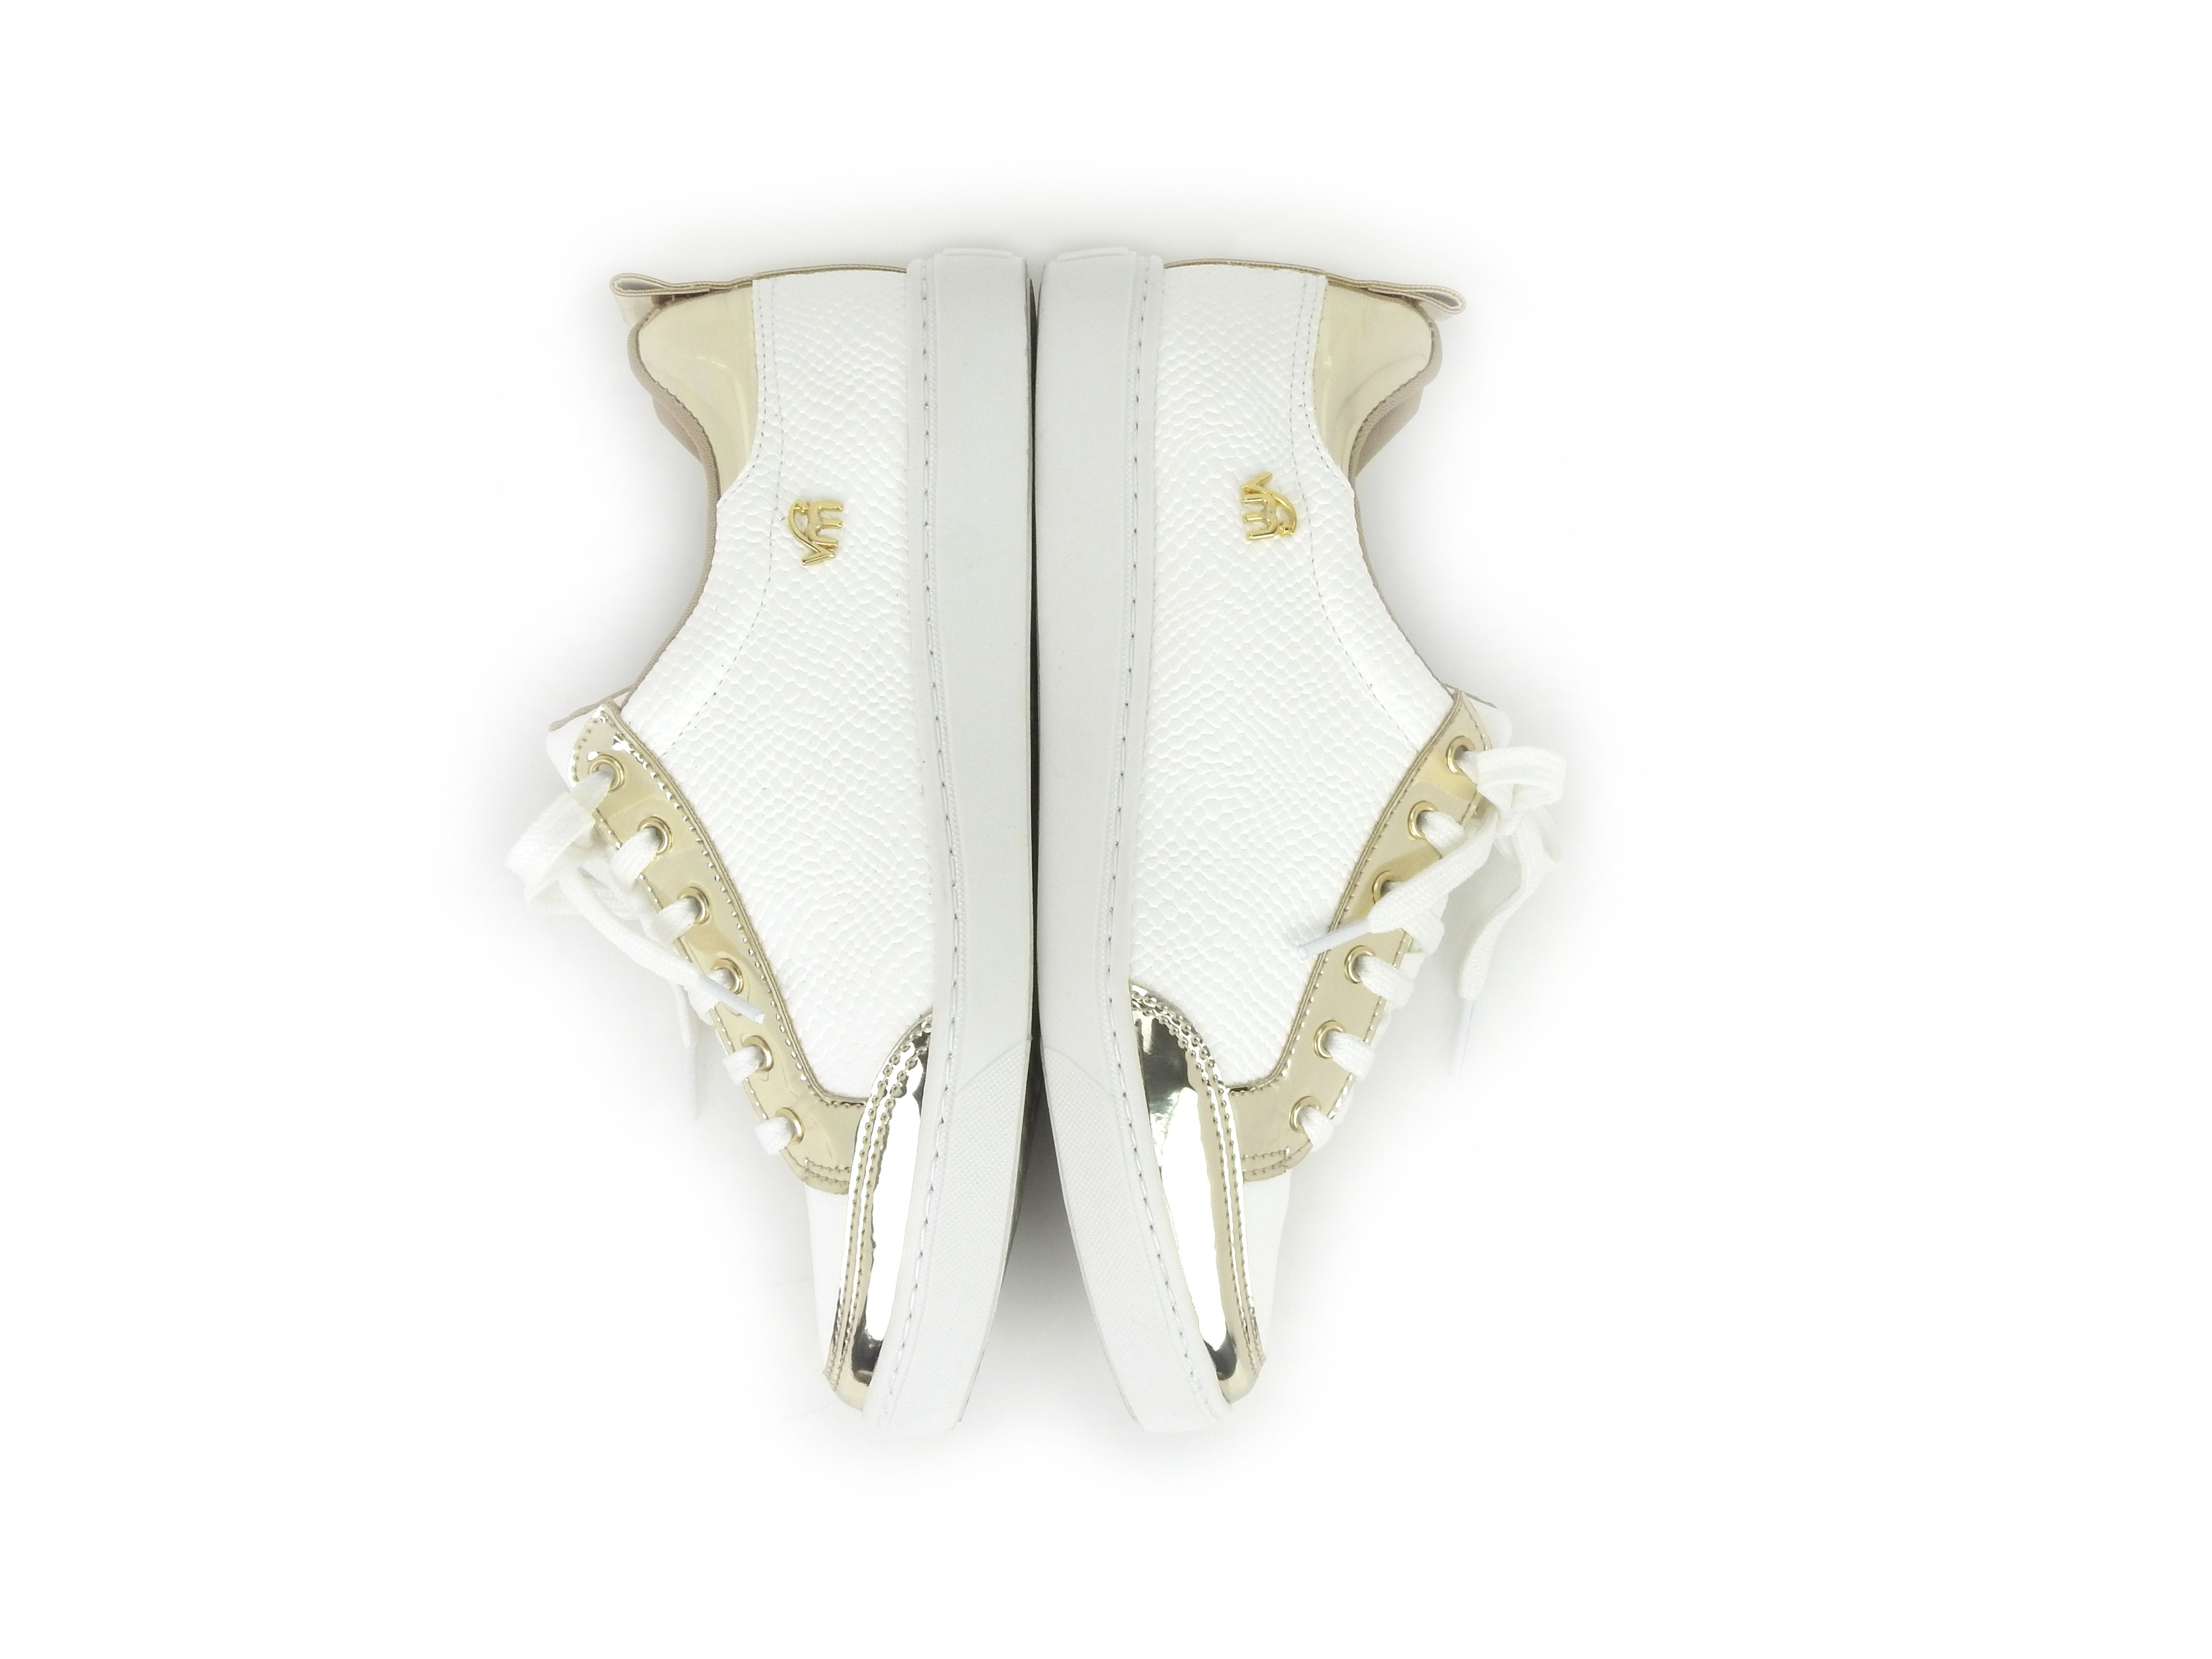 d98725deb Trend - Casual - Metalizado - Sport chic - Ref. 16-12415   tênis ...